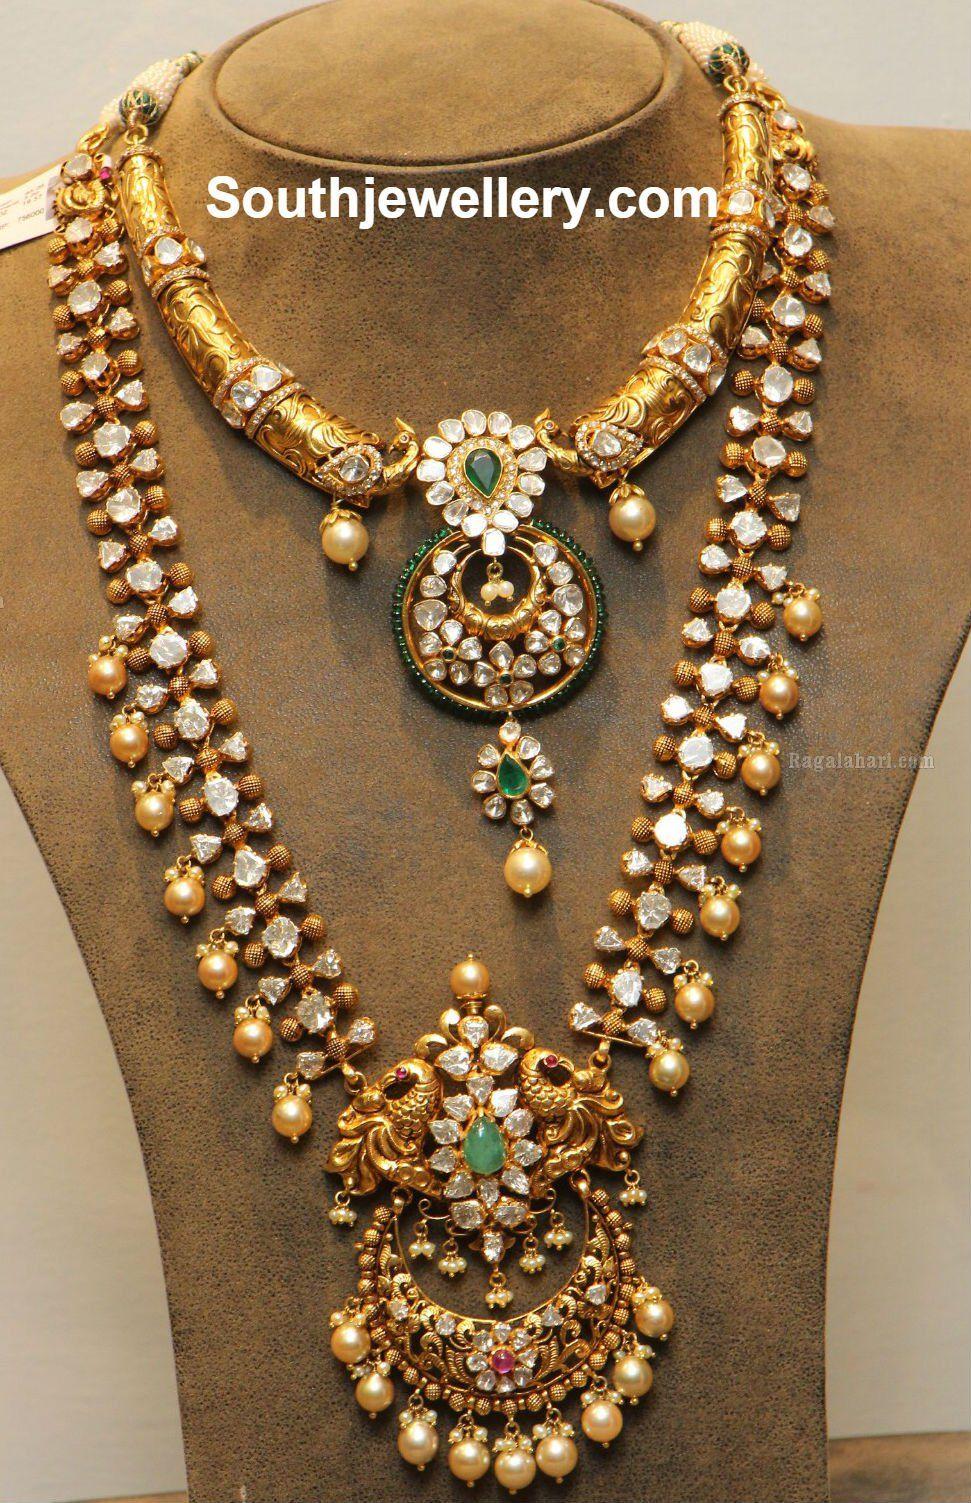 Polki Peacock Choker and Long Chain Diamond Necklaces